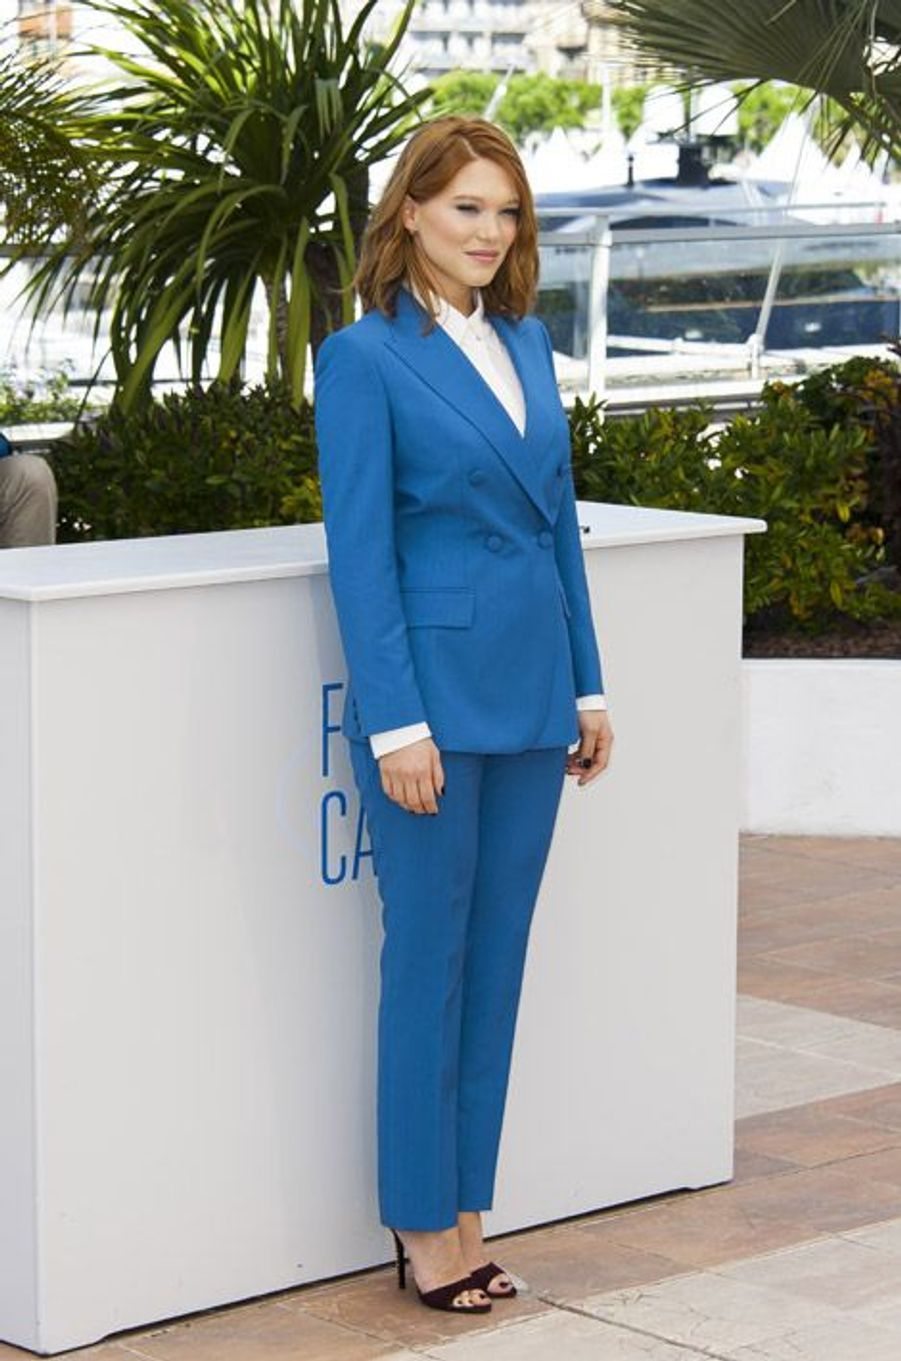 Léa Seydoux en Prada lors du Festival de Cannes, le 17 mai 2014